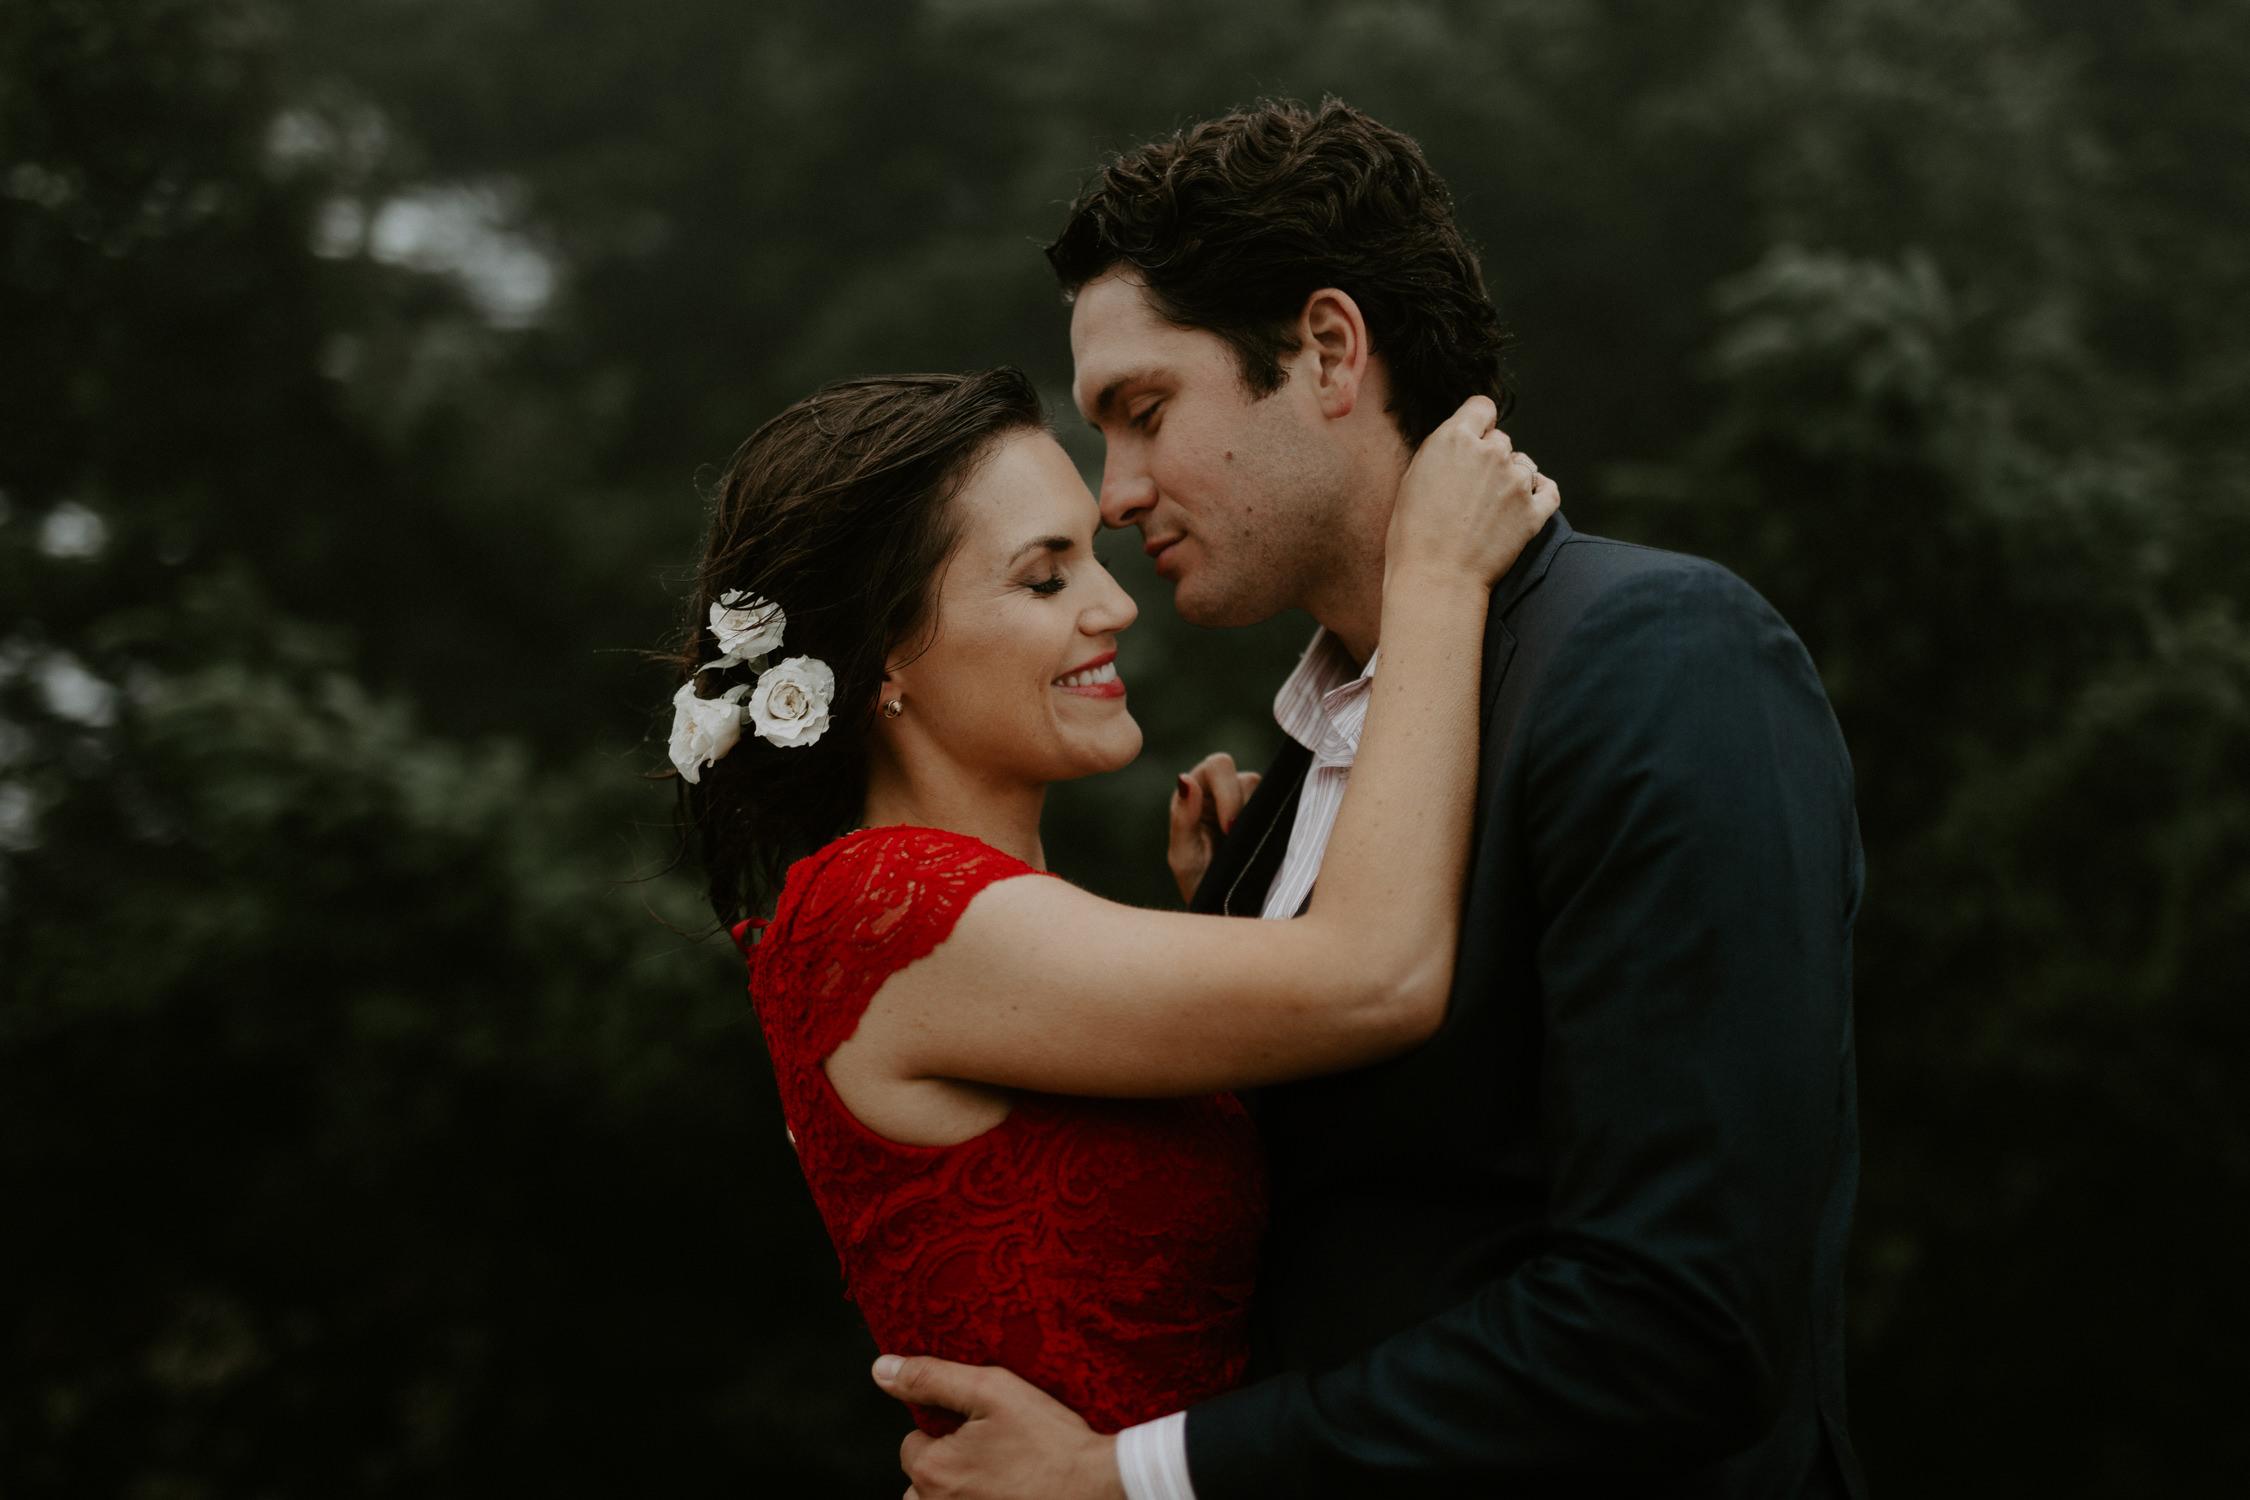 couple-intimate-engagement-session-mt-tam-30.jpg